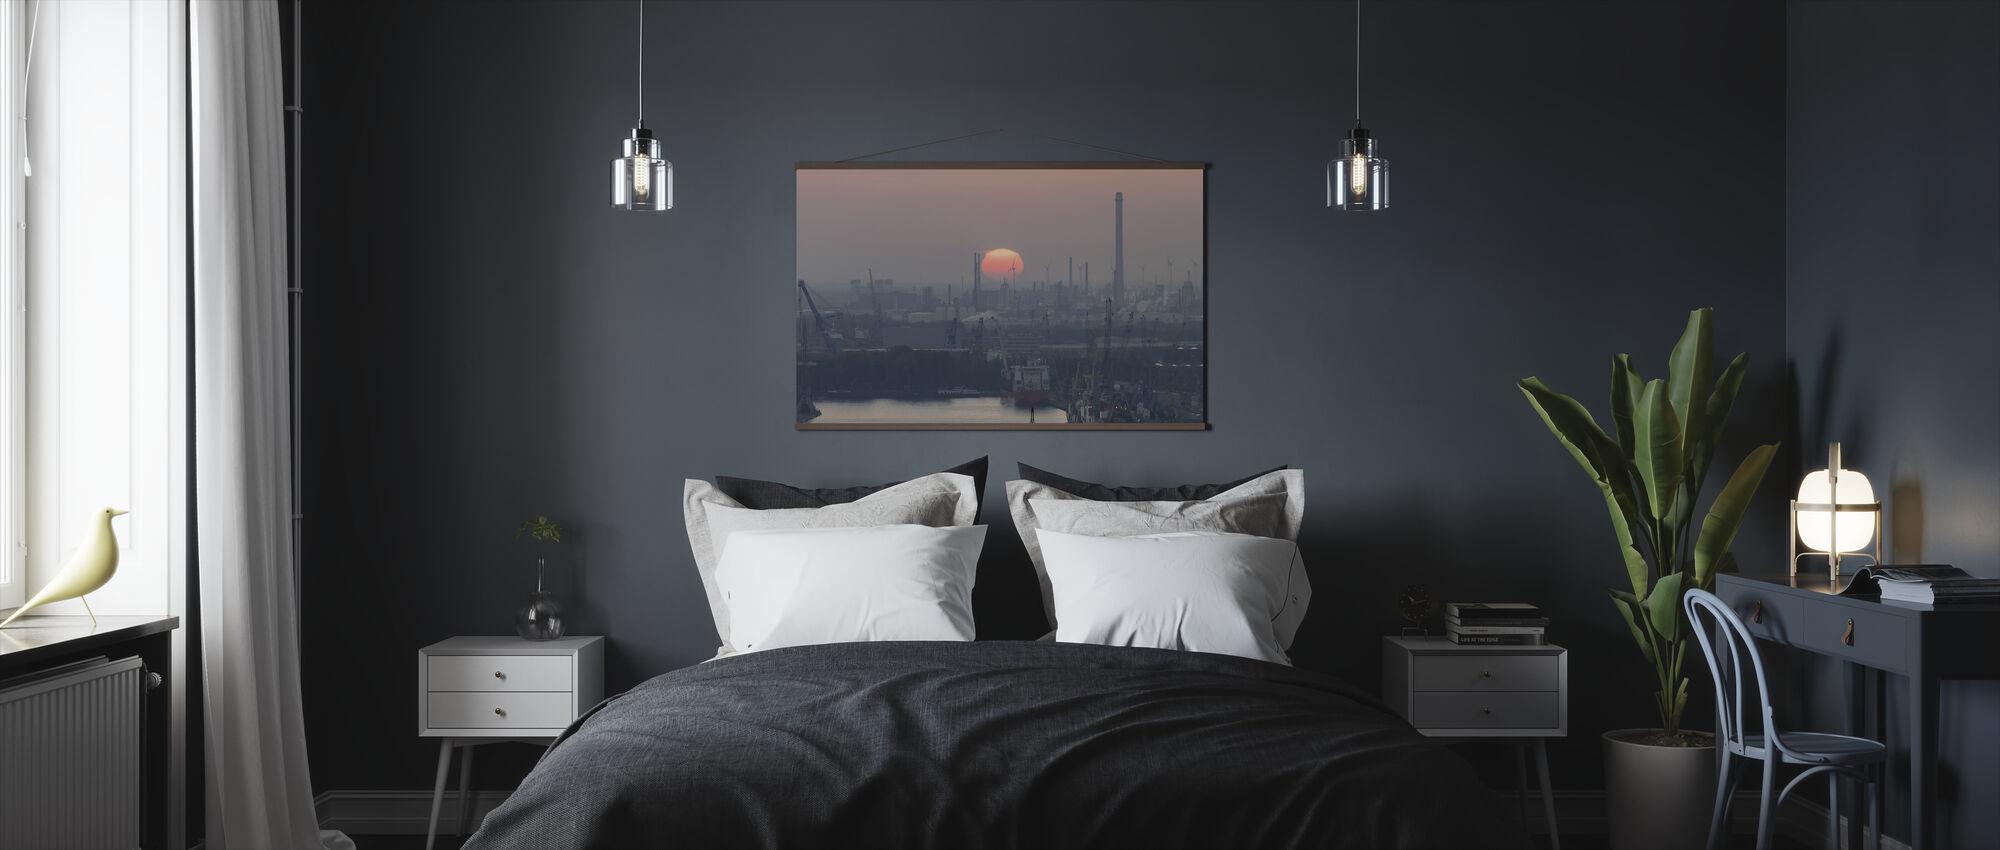 Rotterdam Port at Sunset - Poster - Bedroom